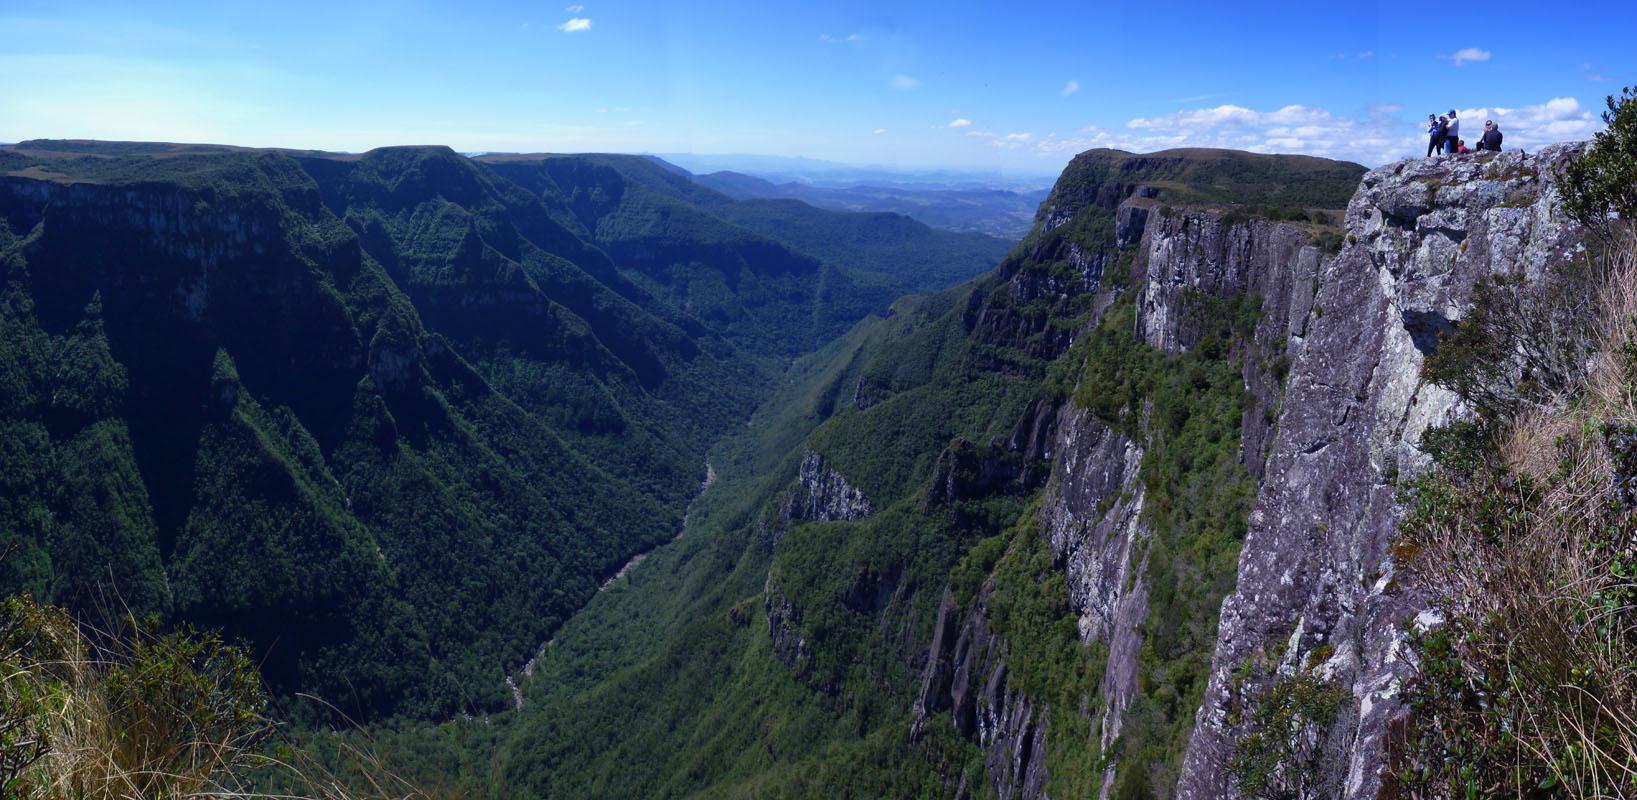 Blick in den Canyon Richtung Santa Catarina